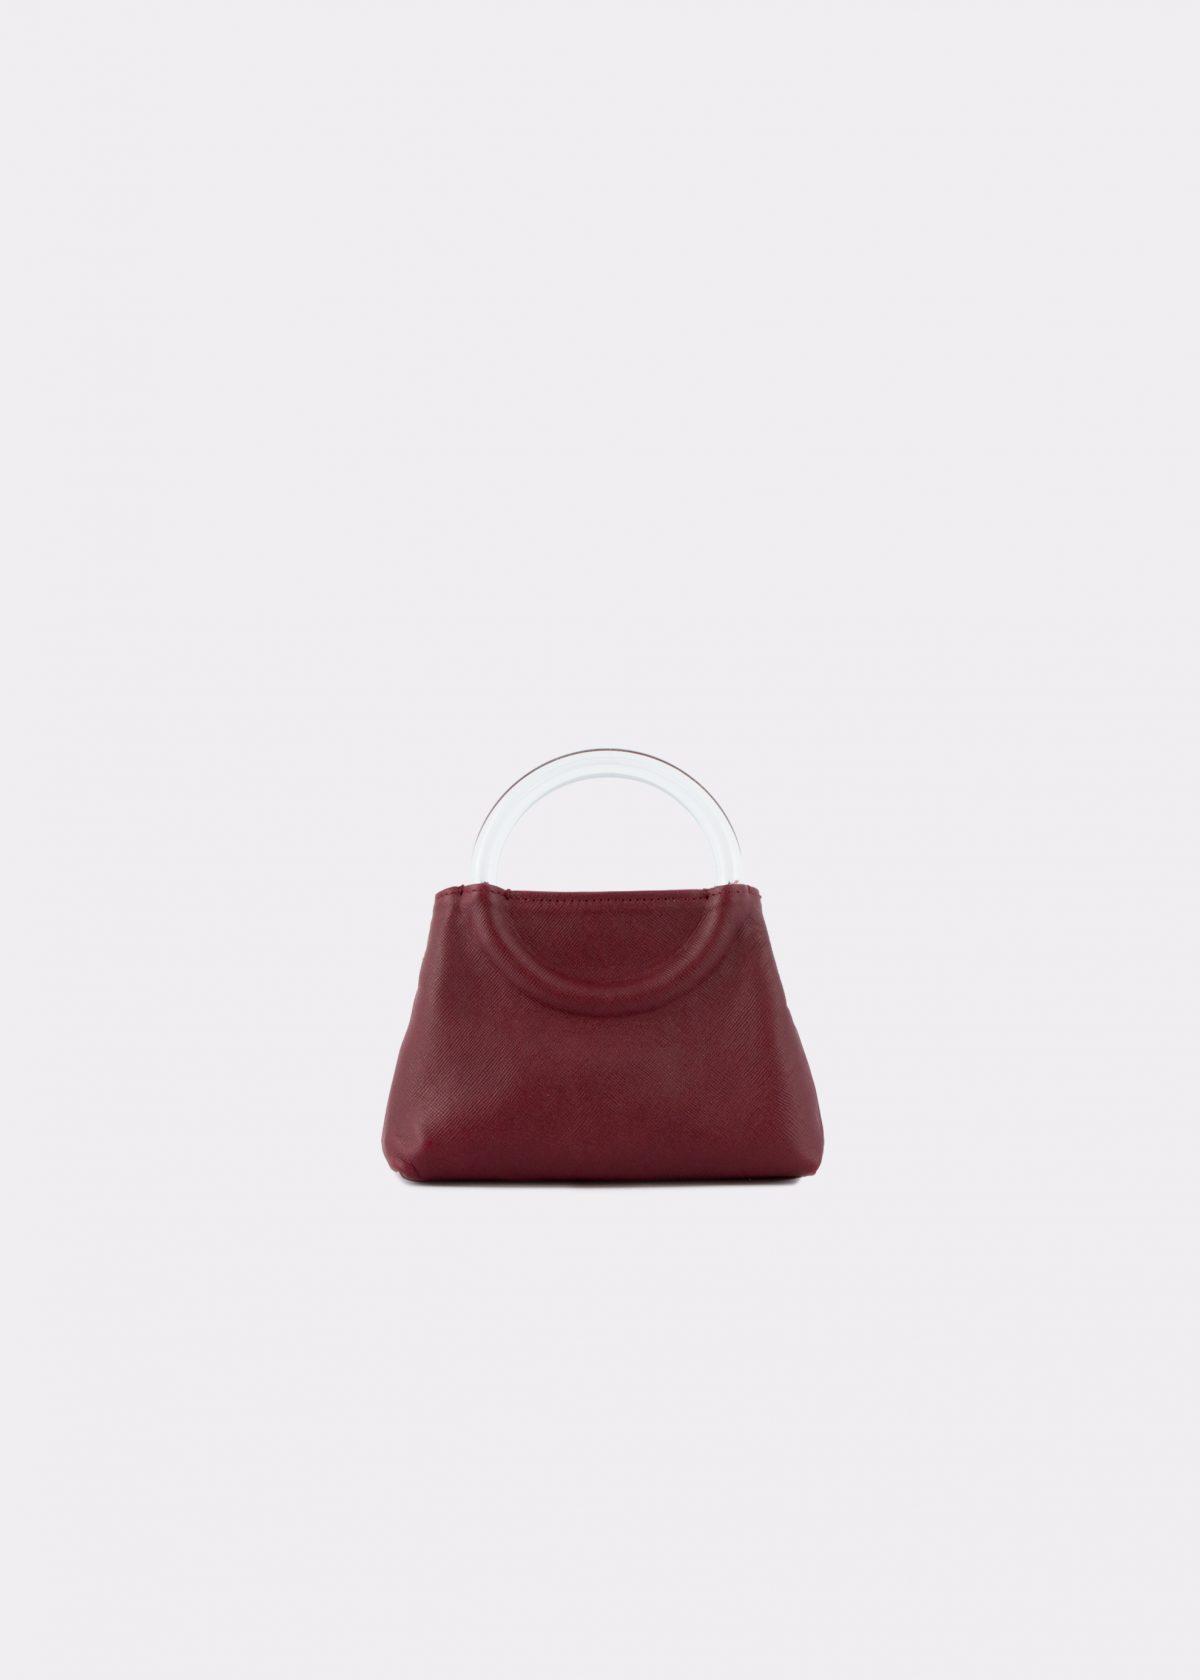 NIDO-Bolla_Micro-bag-bordeaux_front view